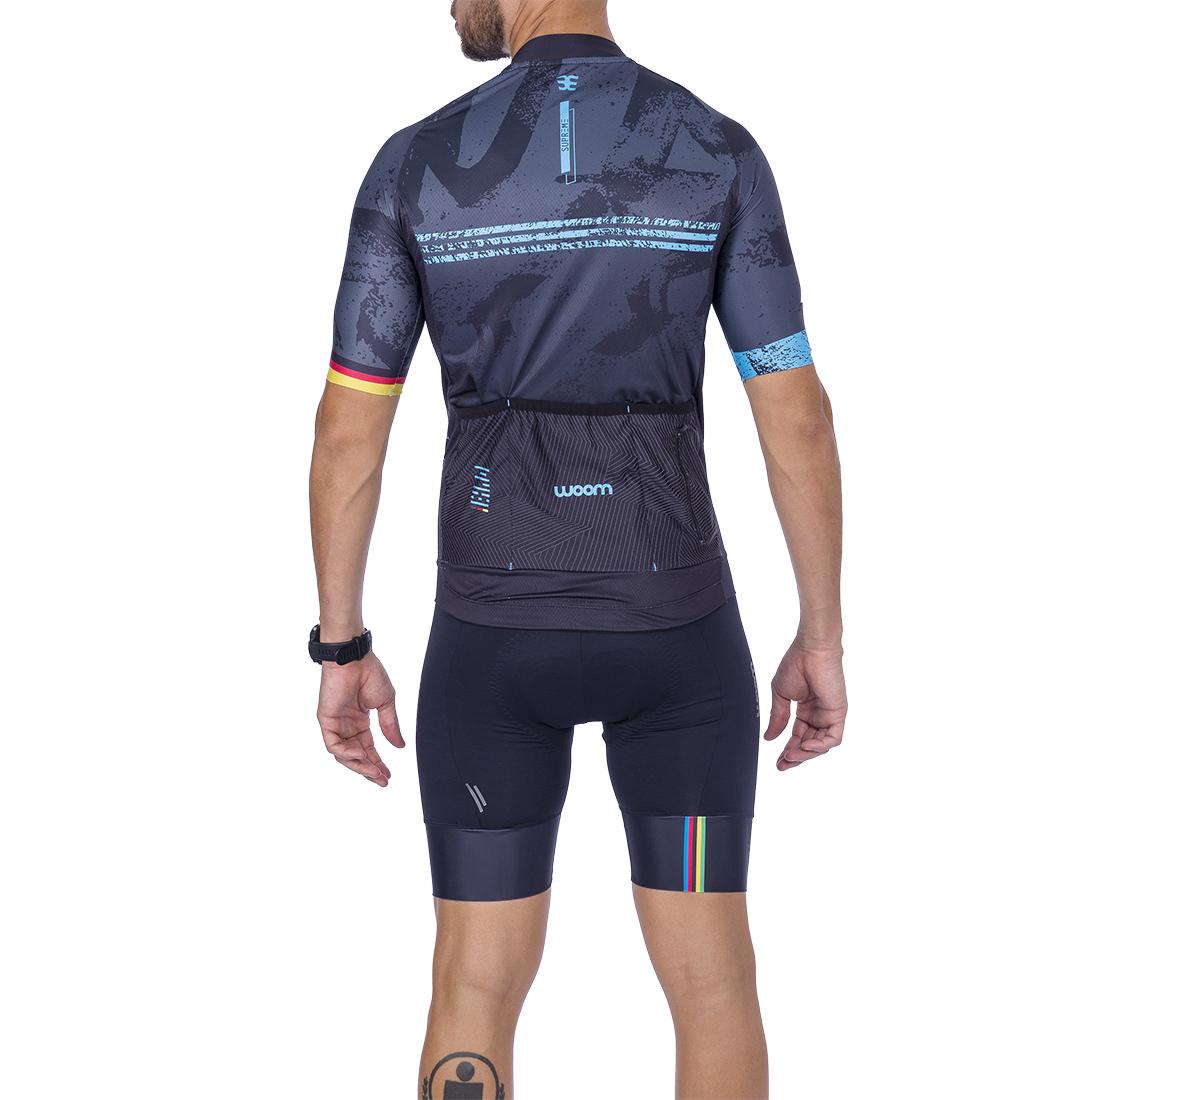 Camisa Ciclismo Supreme Berlin Masc - 2021